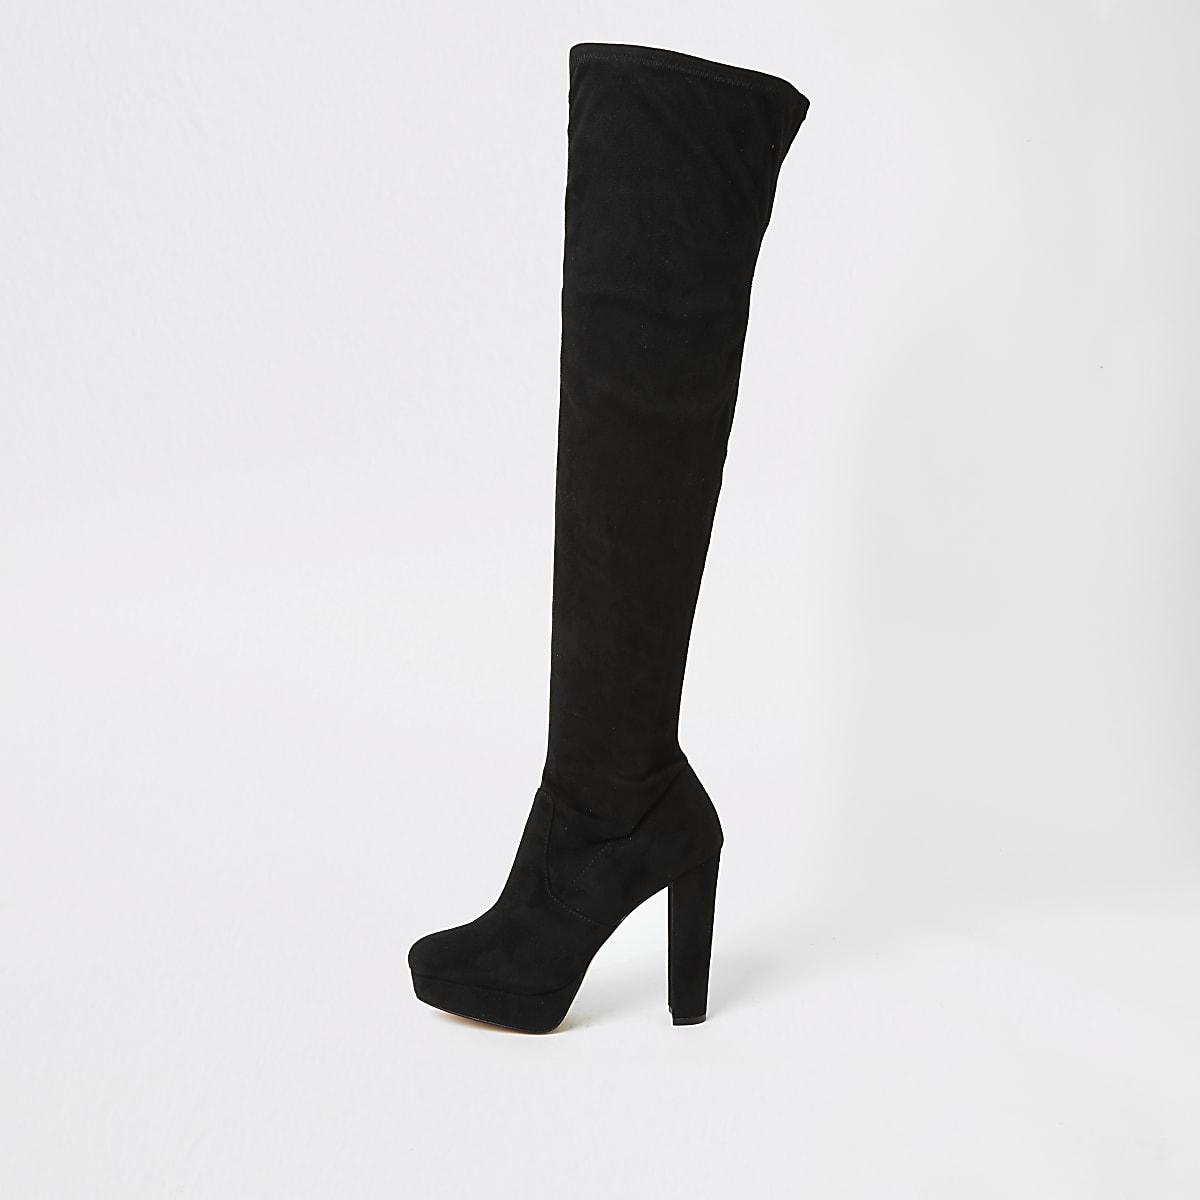 latest fashion autumn shoes wholesale dealer Black high leg wide fit platform heeled boots | River Island